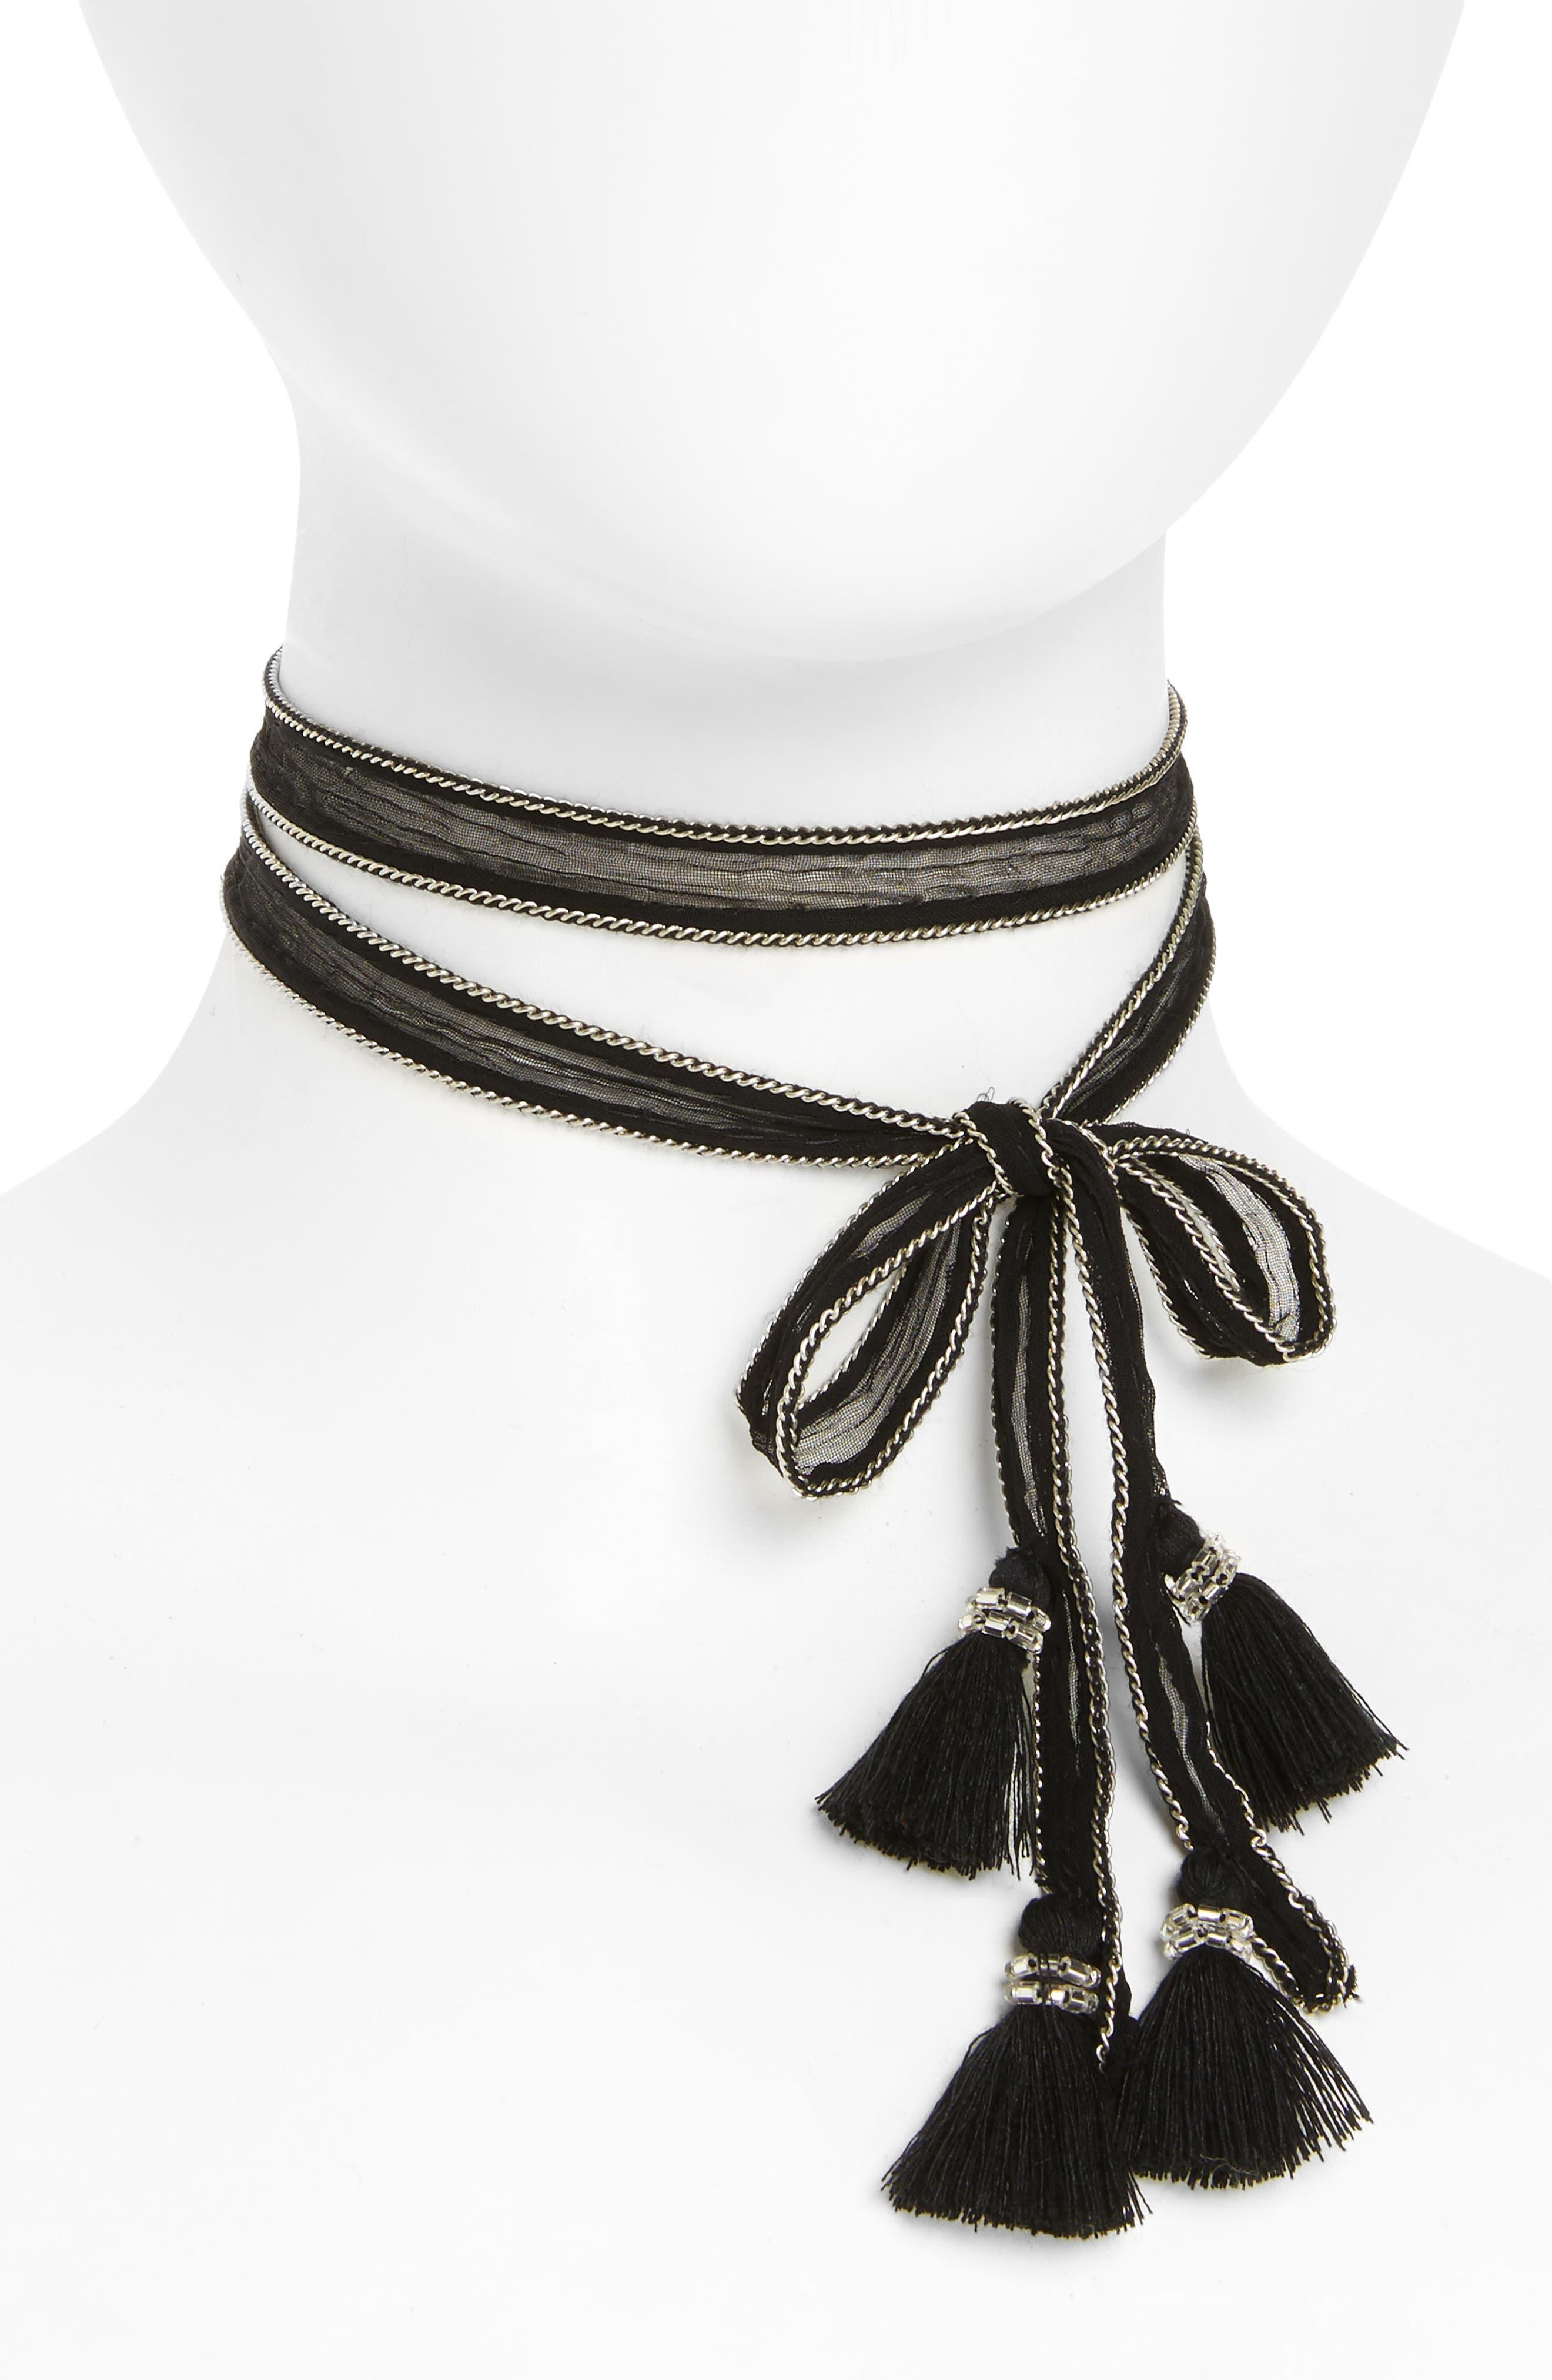 Alternate Image 1 Selected - Chan Luu Chiffon Tie Necklace